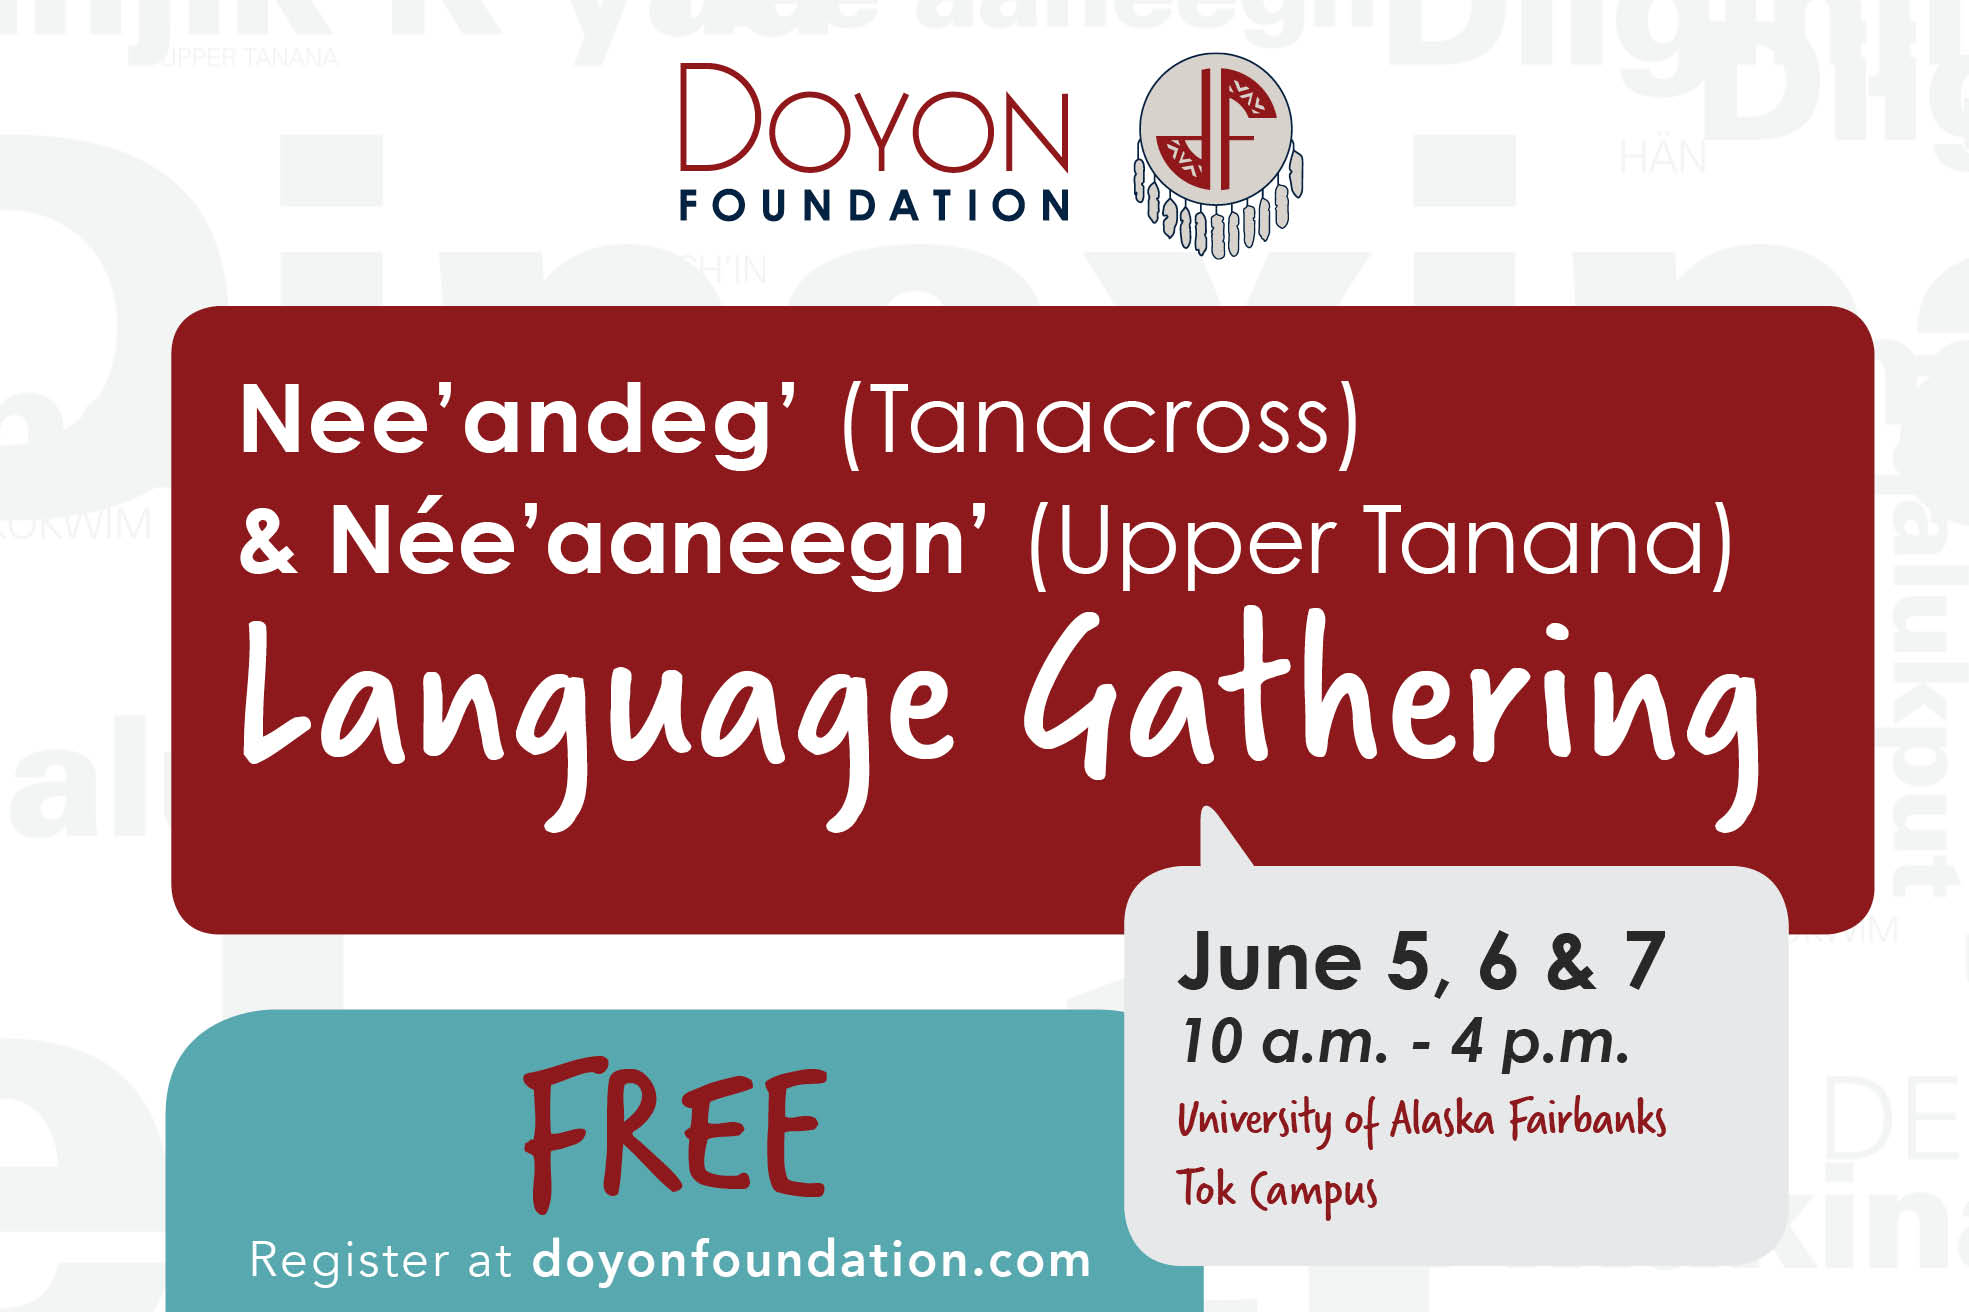 38_DF_DLO Language Gathering Promotion_blog2